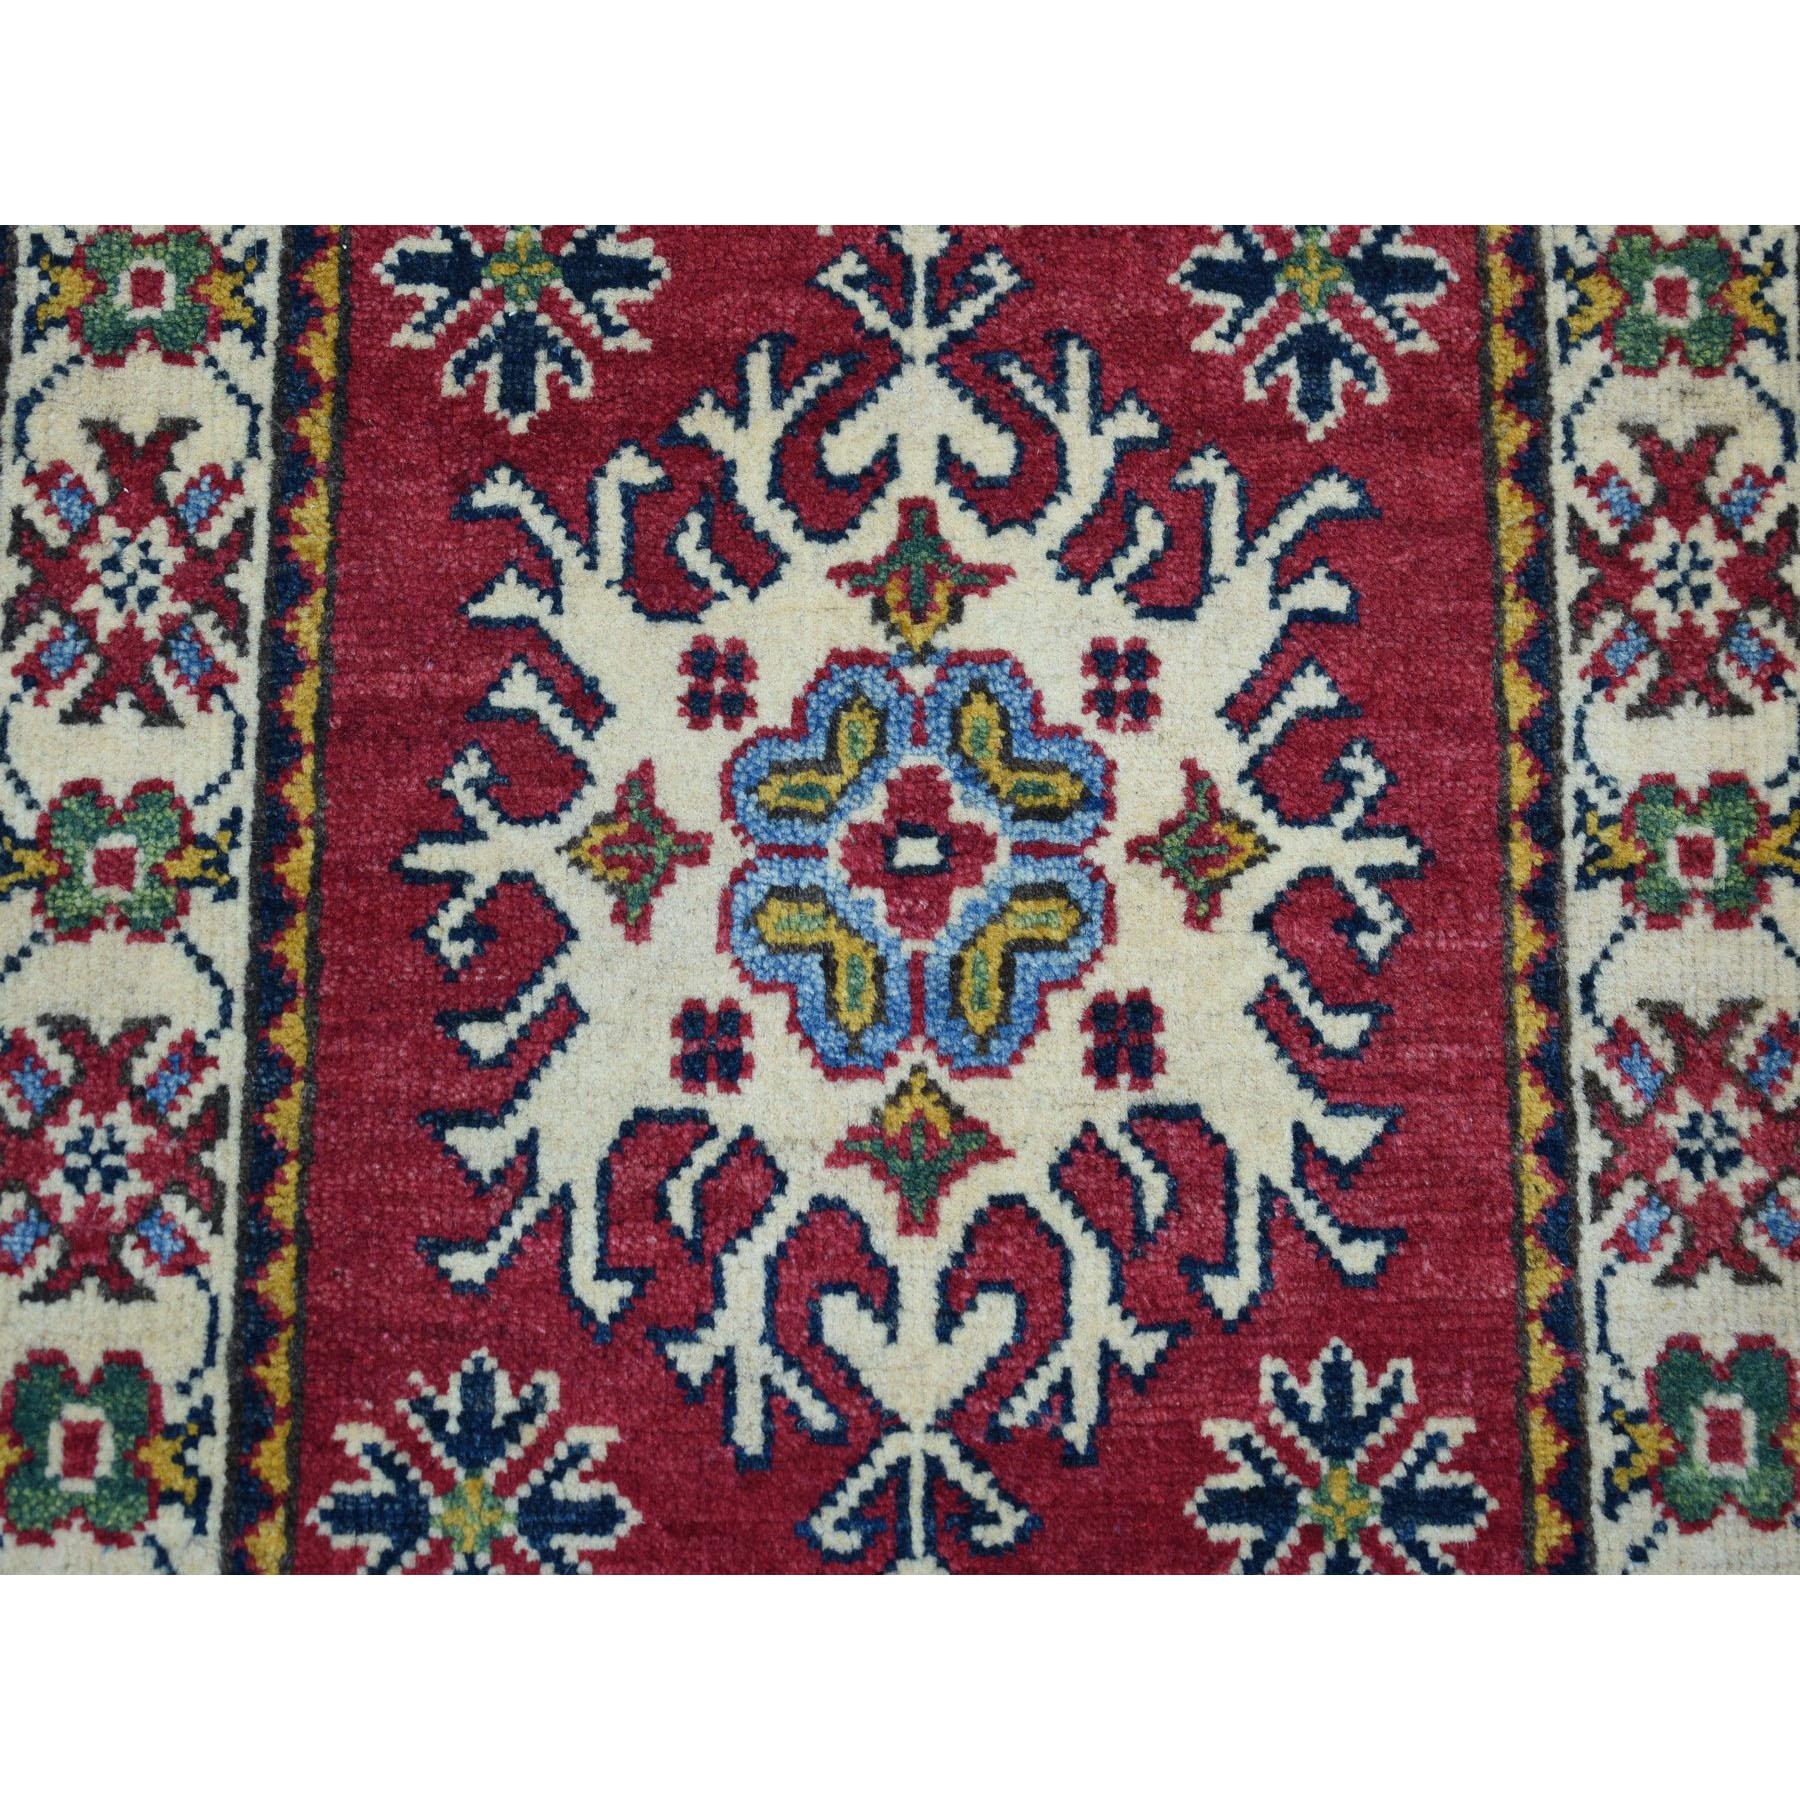 2'x3' Red Kazak Geometric Design Pure Wool Hand-Knotted Oriental Rug